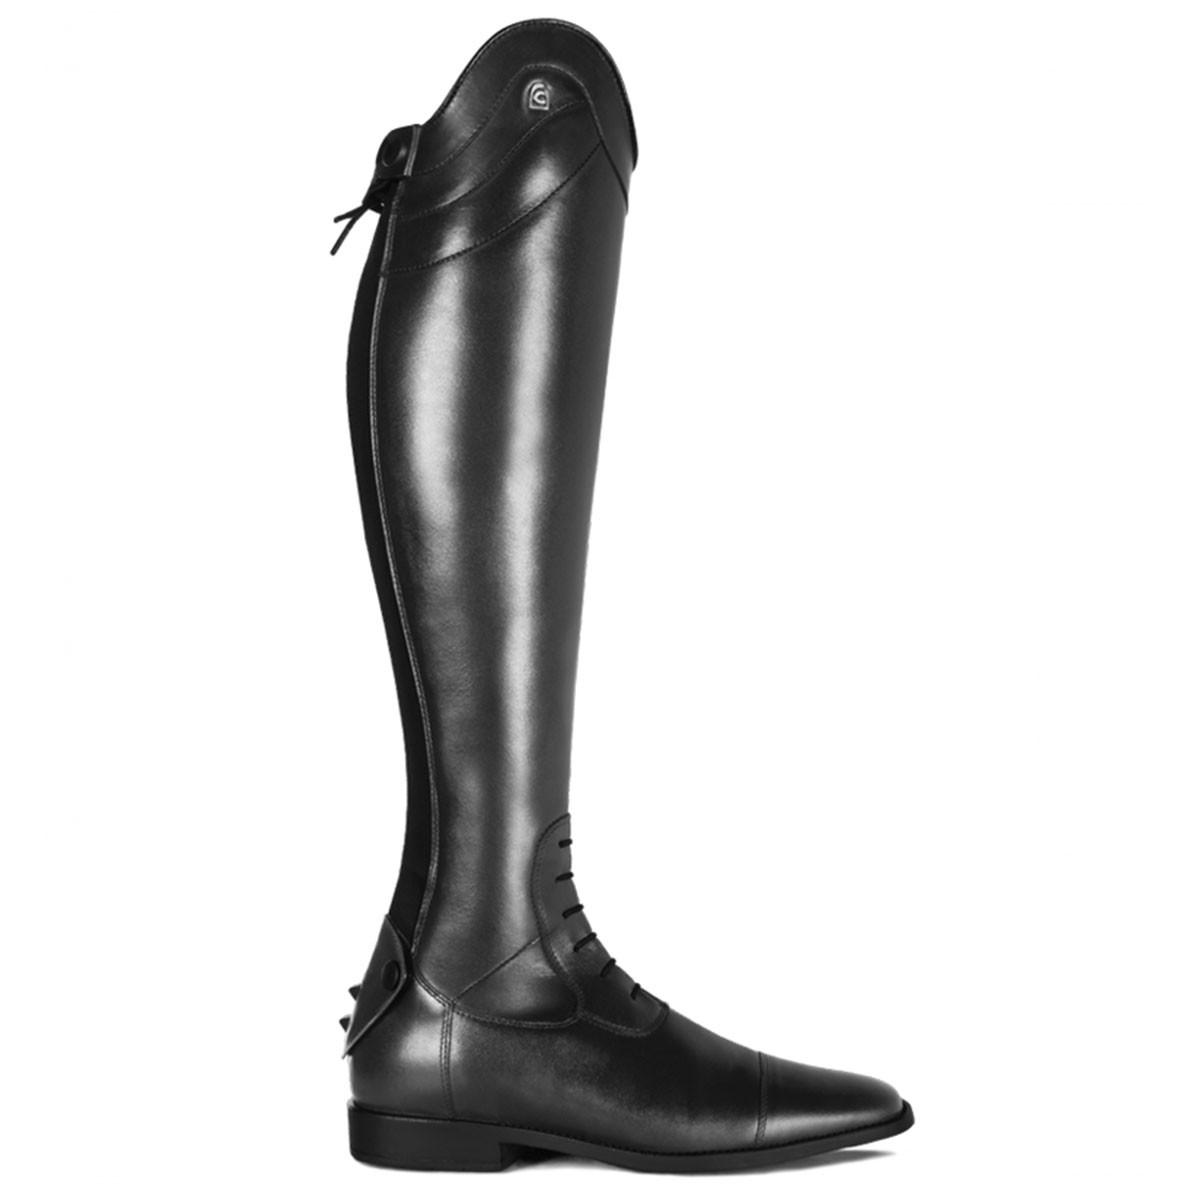 Cavallo Linus Slim rijlaars zwart maat:6-6.5 / h49-w37